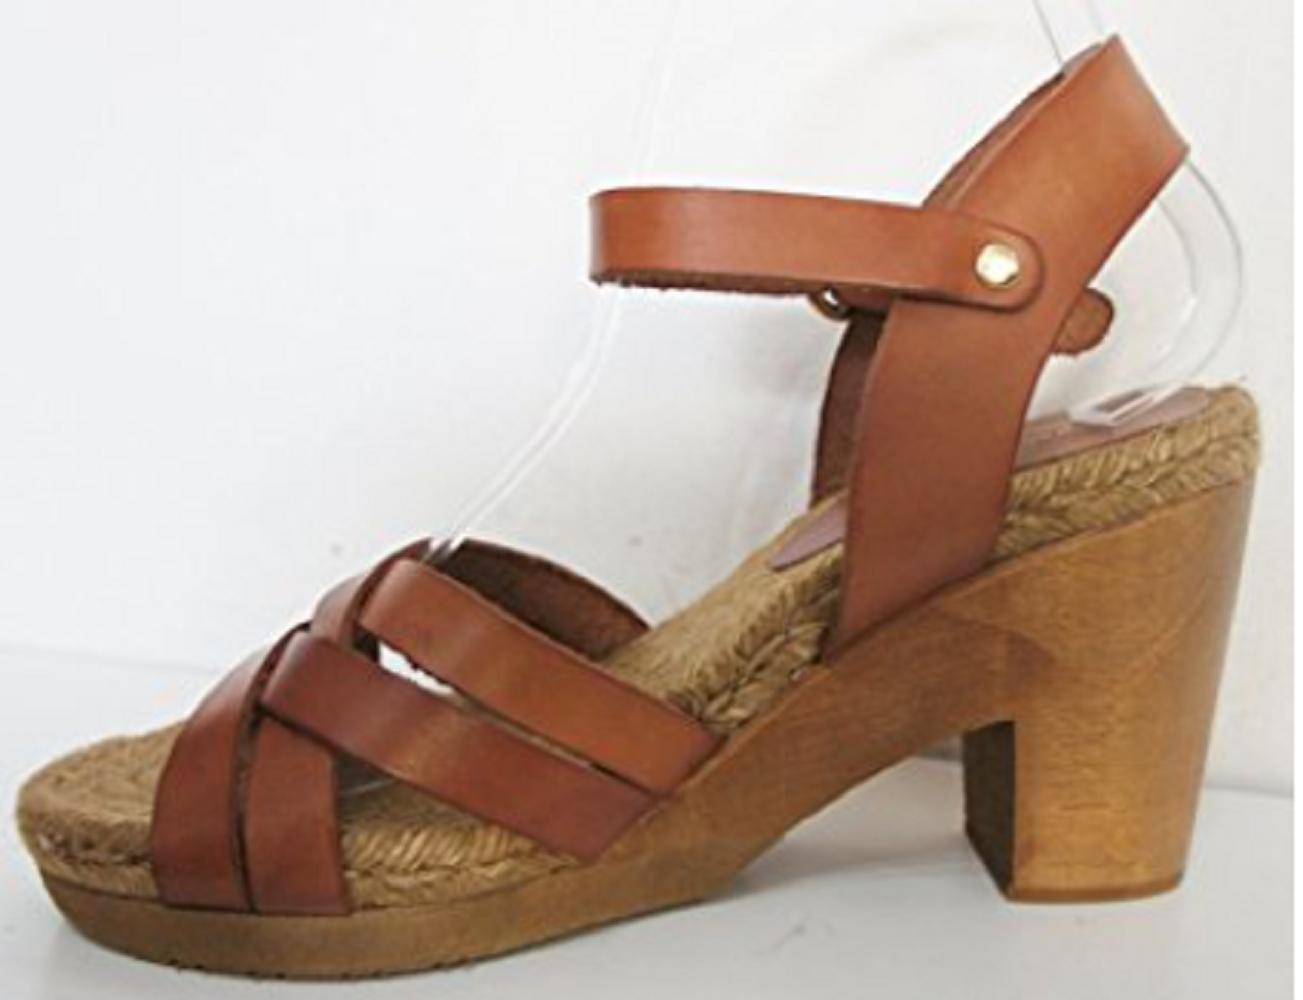 JOHN LEWIS COLLECTION BROOKLYN CUERO TAN Rope Sole Sandals UK8/EU 42